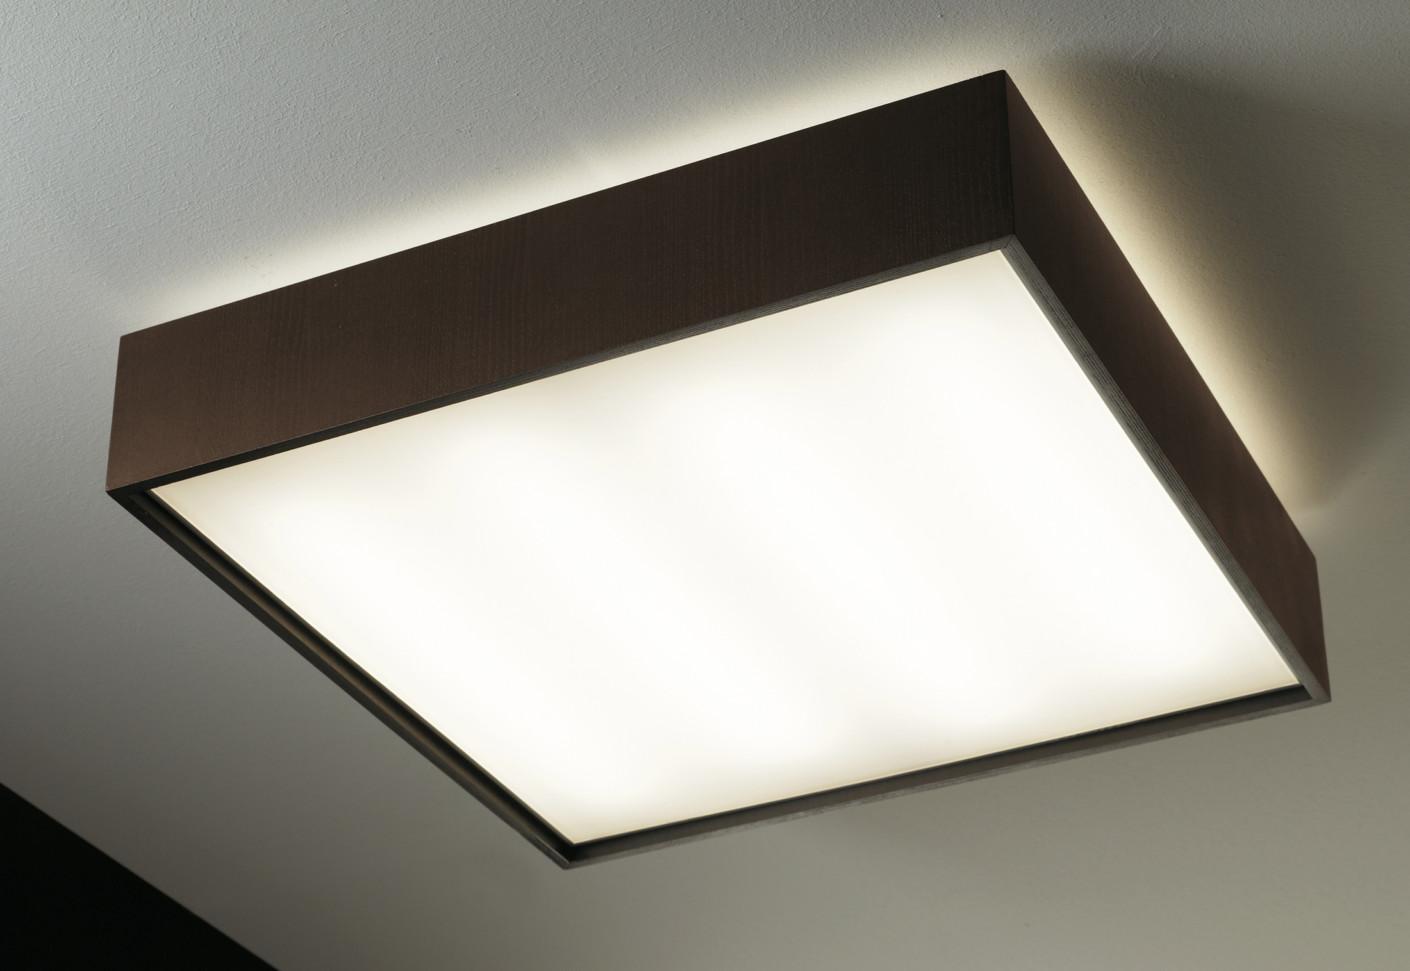 Quadrat C120x120 Plafón LED 6x24,8W - Madera wengue